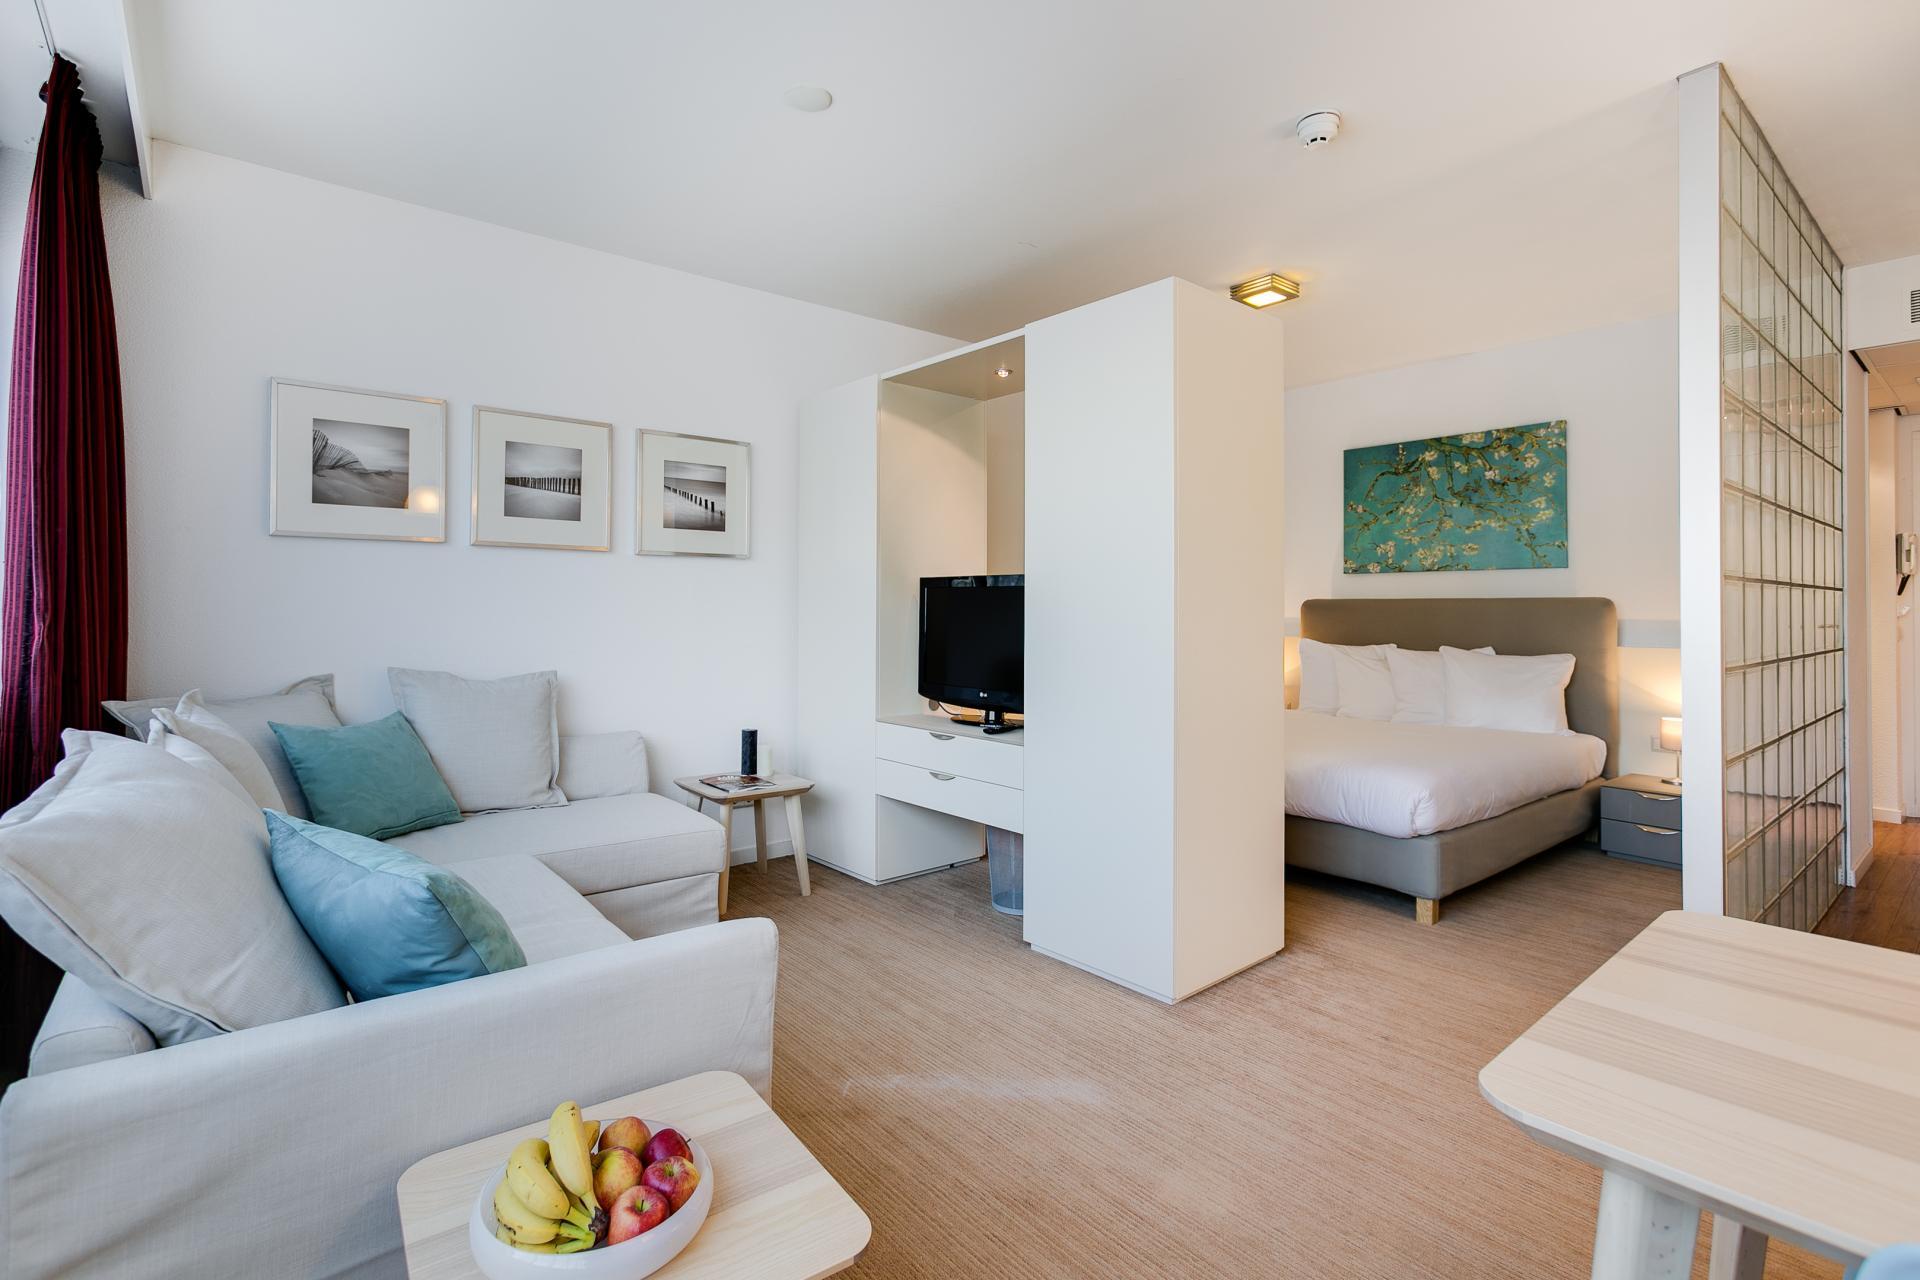 Living room at Htel Amstelveen, Amsterdam